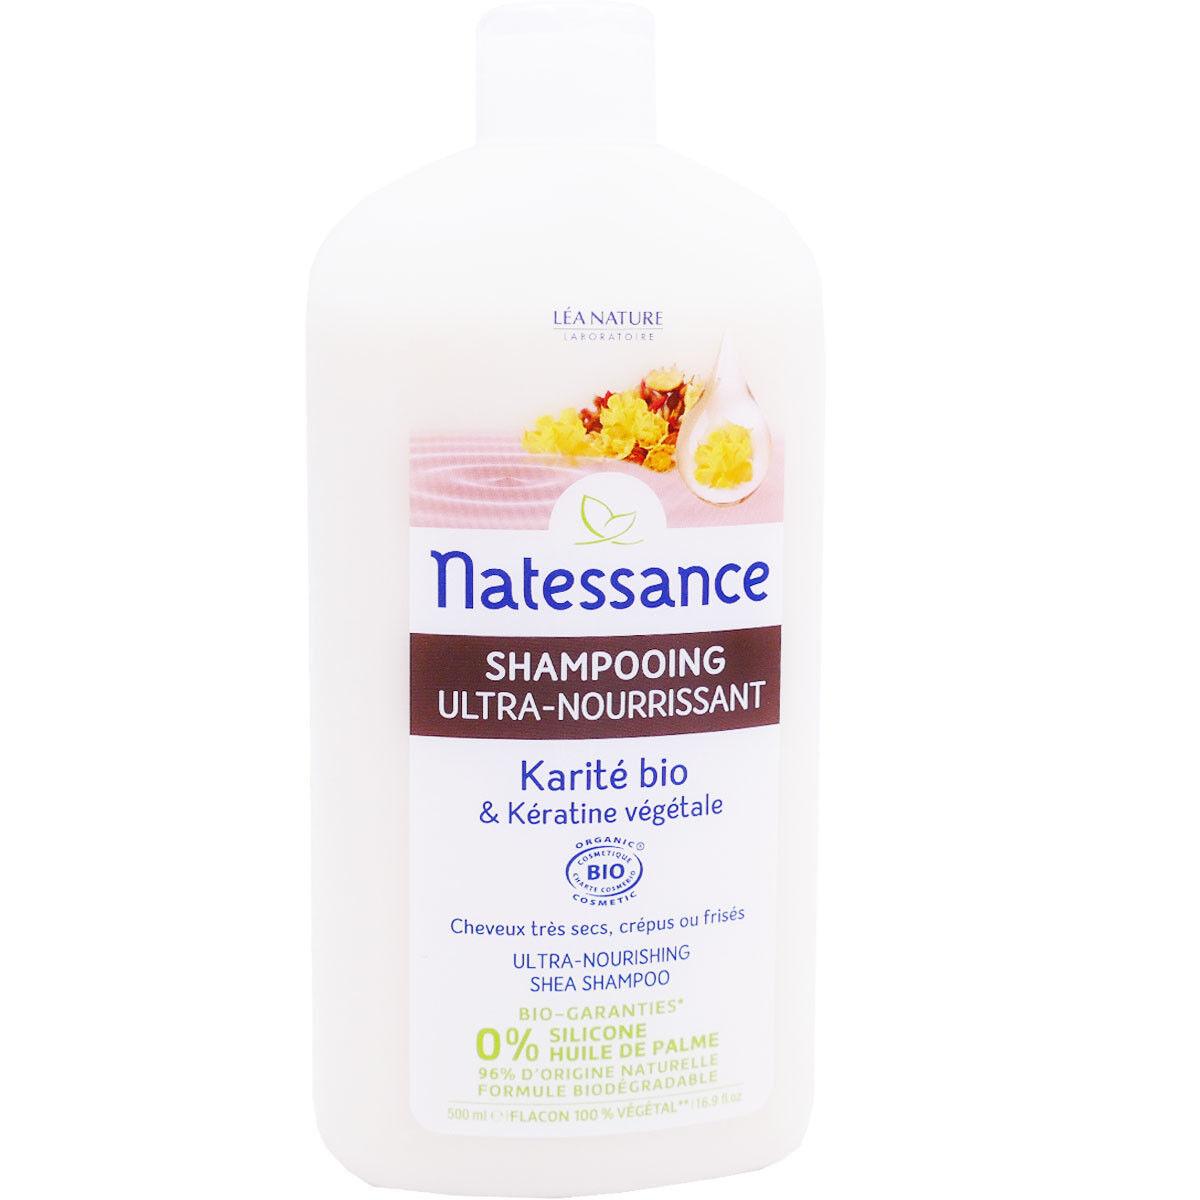 Natessance shampooing karite bio 500 ml